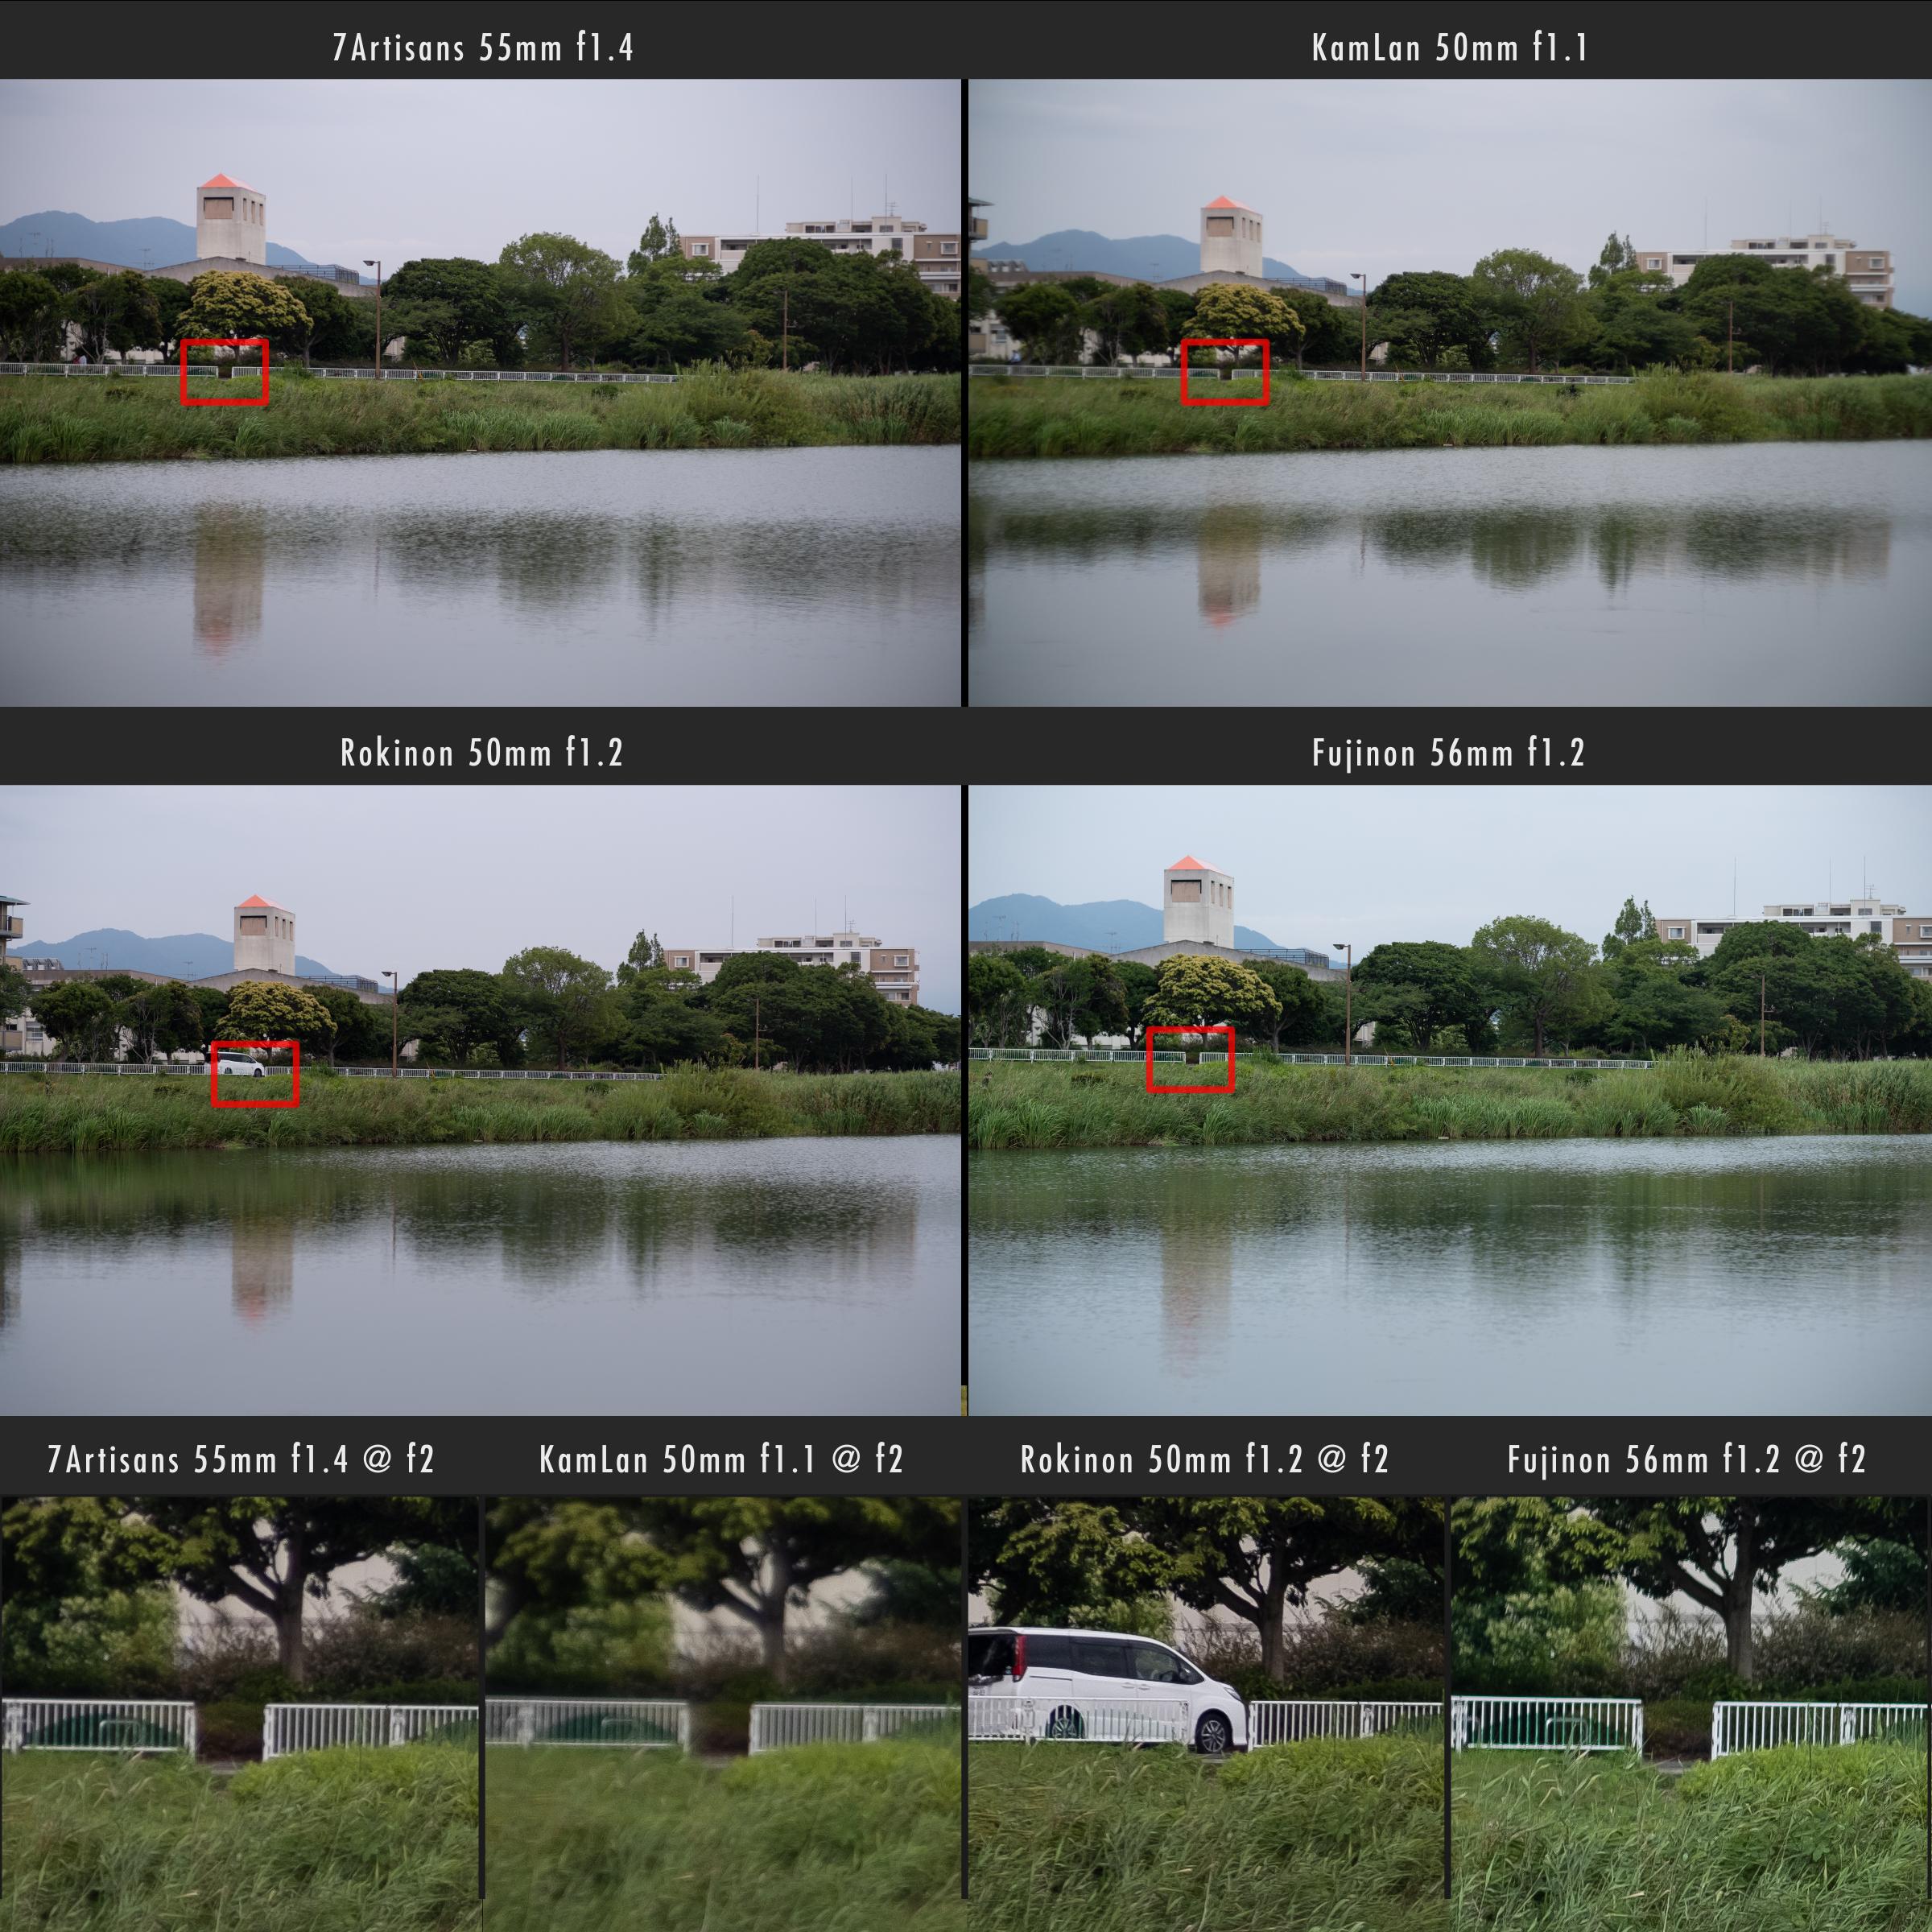 Kamlan 50mm f1.1 vs 7Artisans 55mm f1.4 vs Rokinon 50mm f1.2 Mid Sharpness Comparison